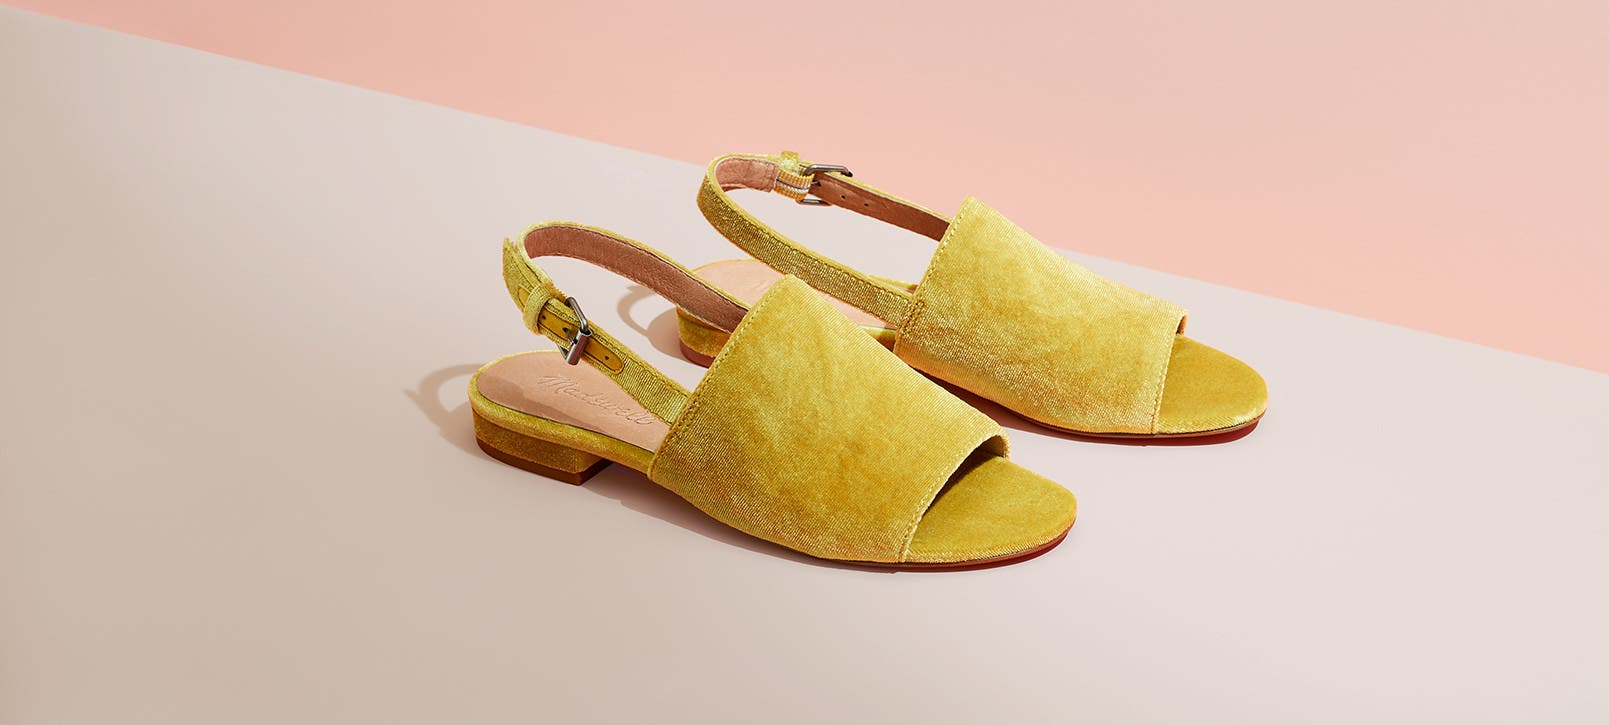 Stunning summer shoes.